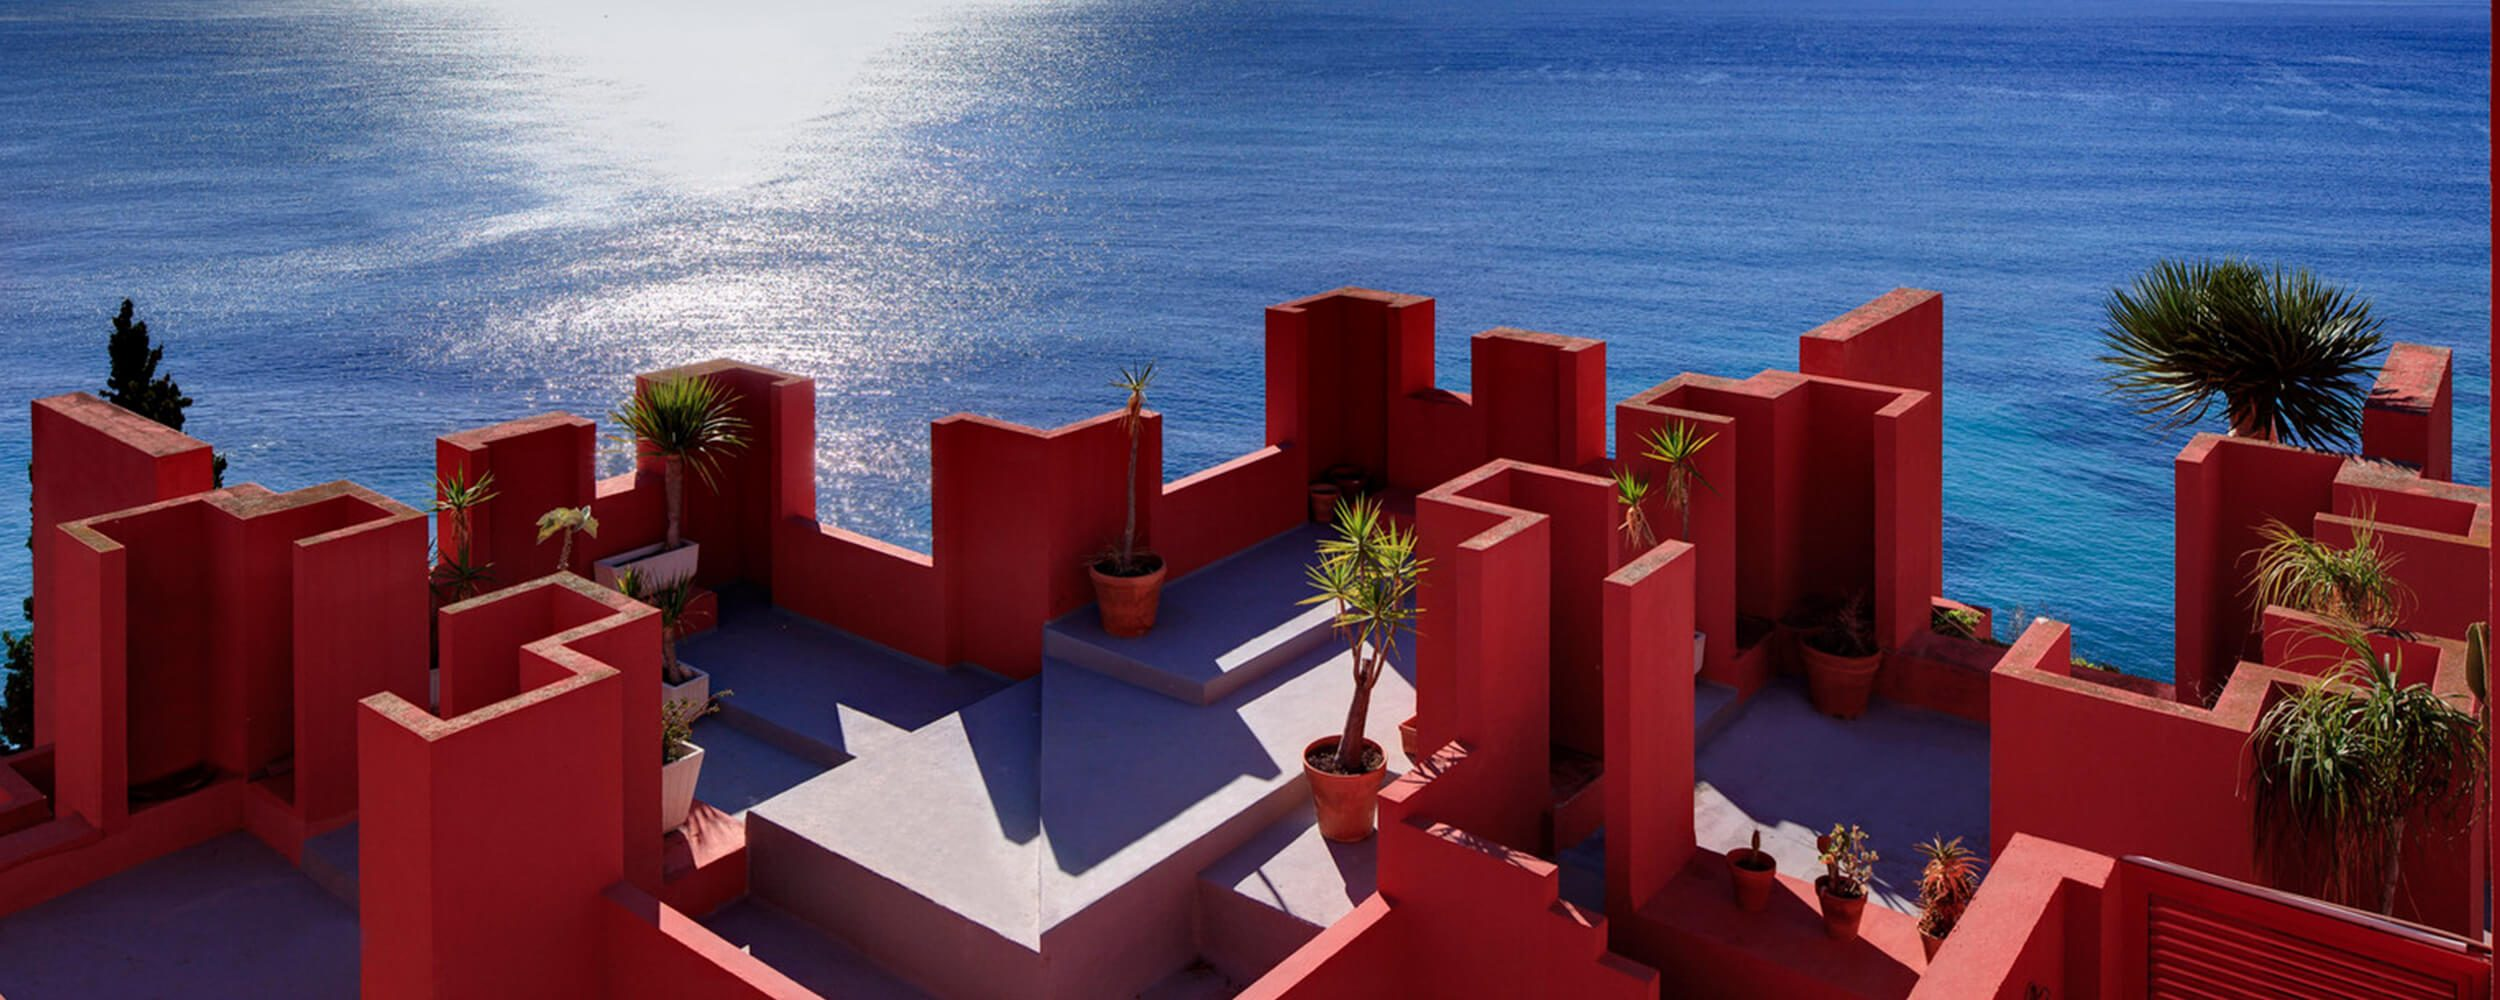 Airbnb spain sea view